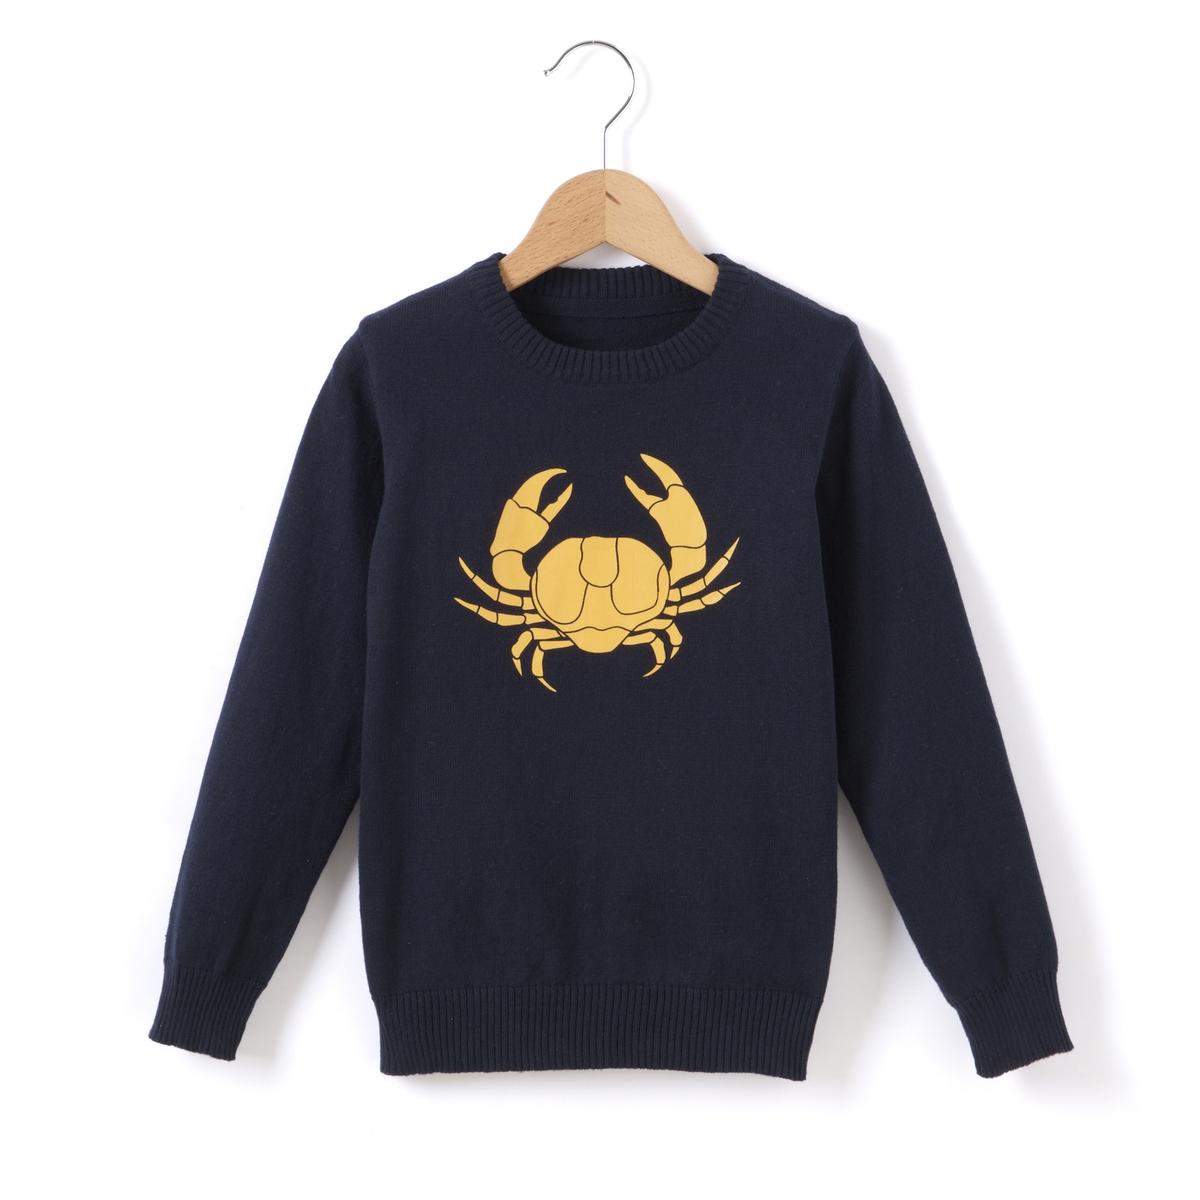 Пуловер с рисунком краб 3 - 12 лет